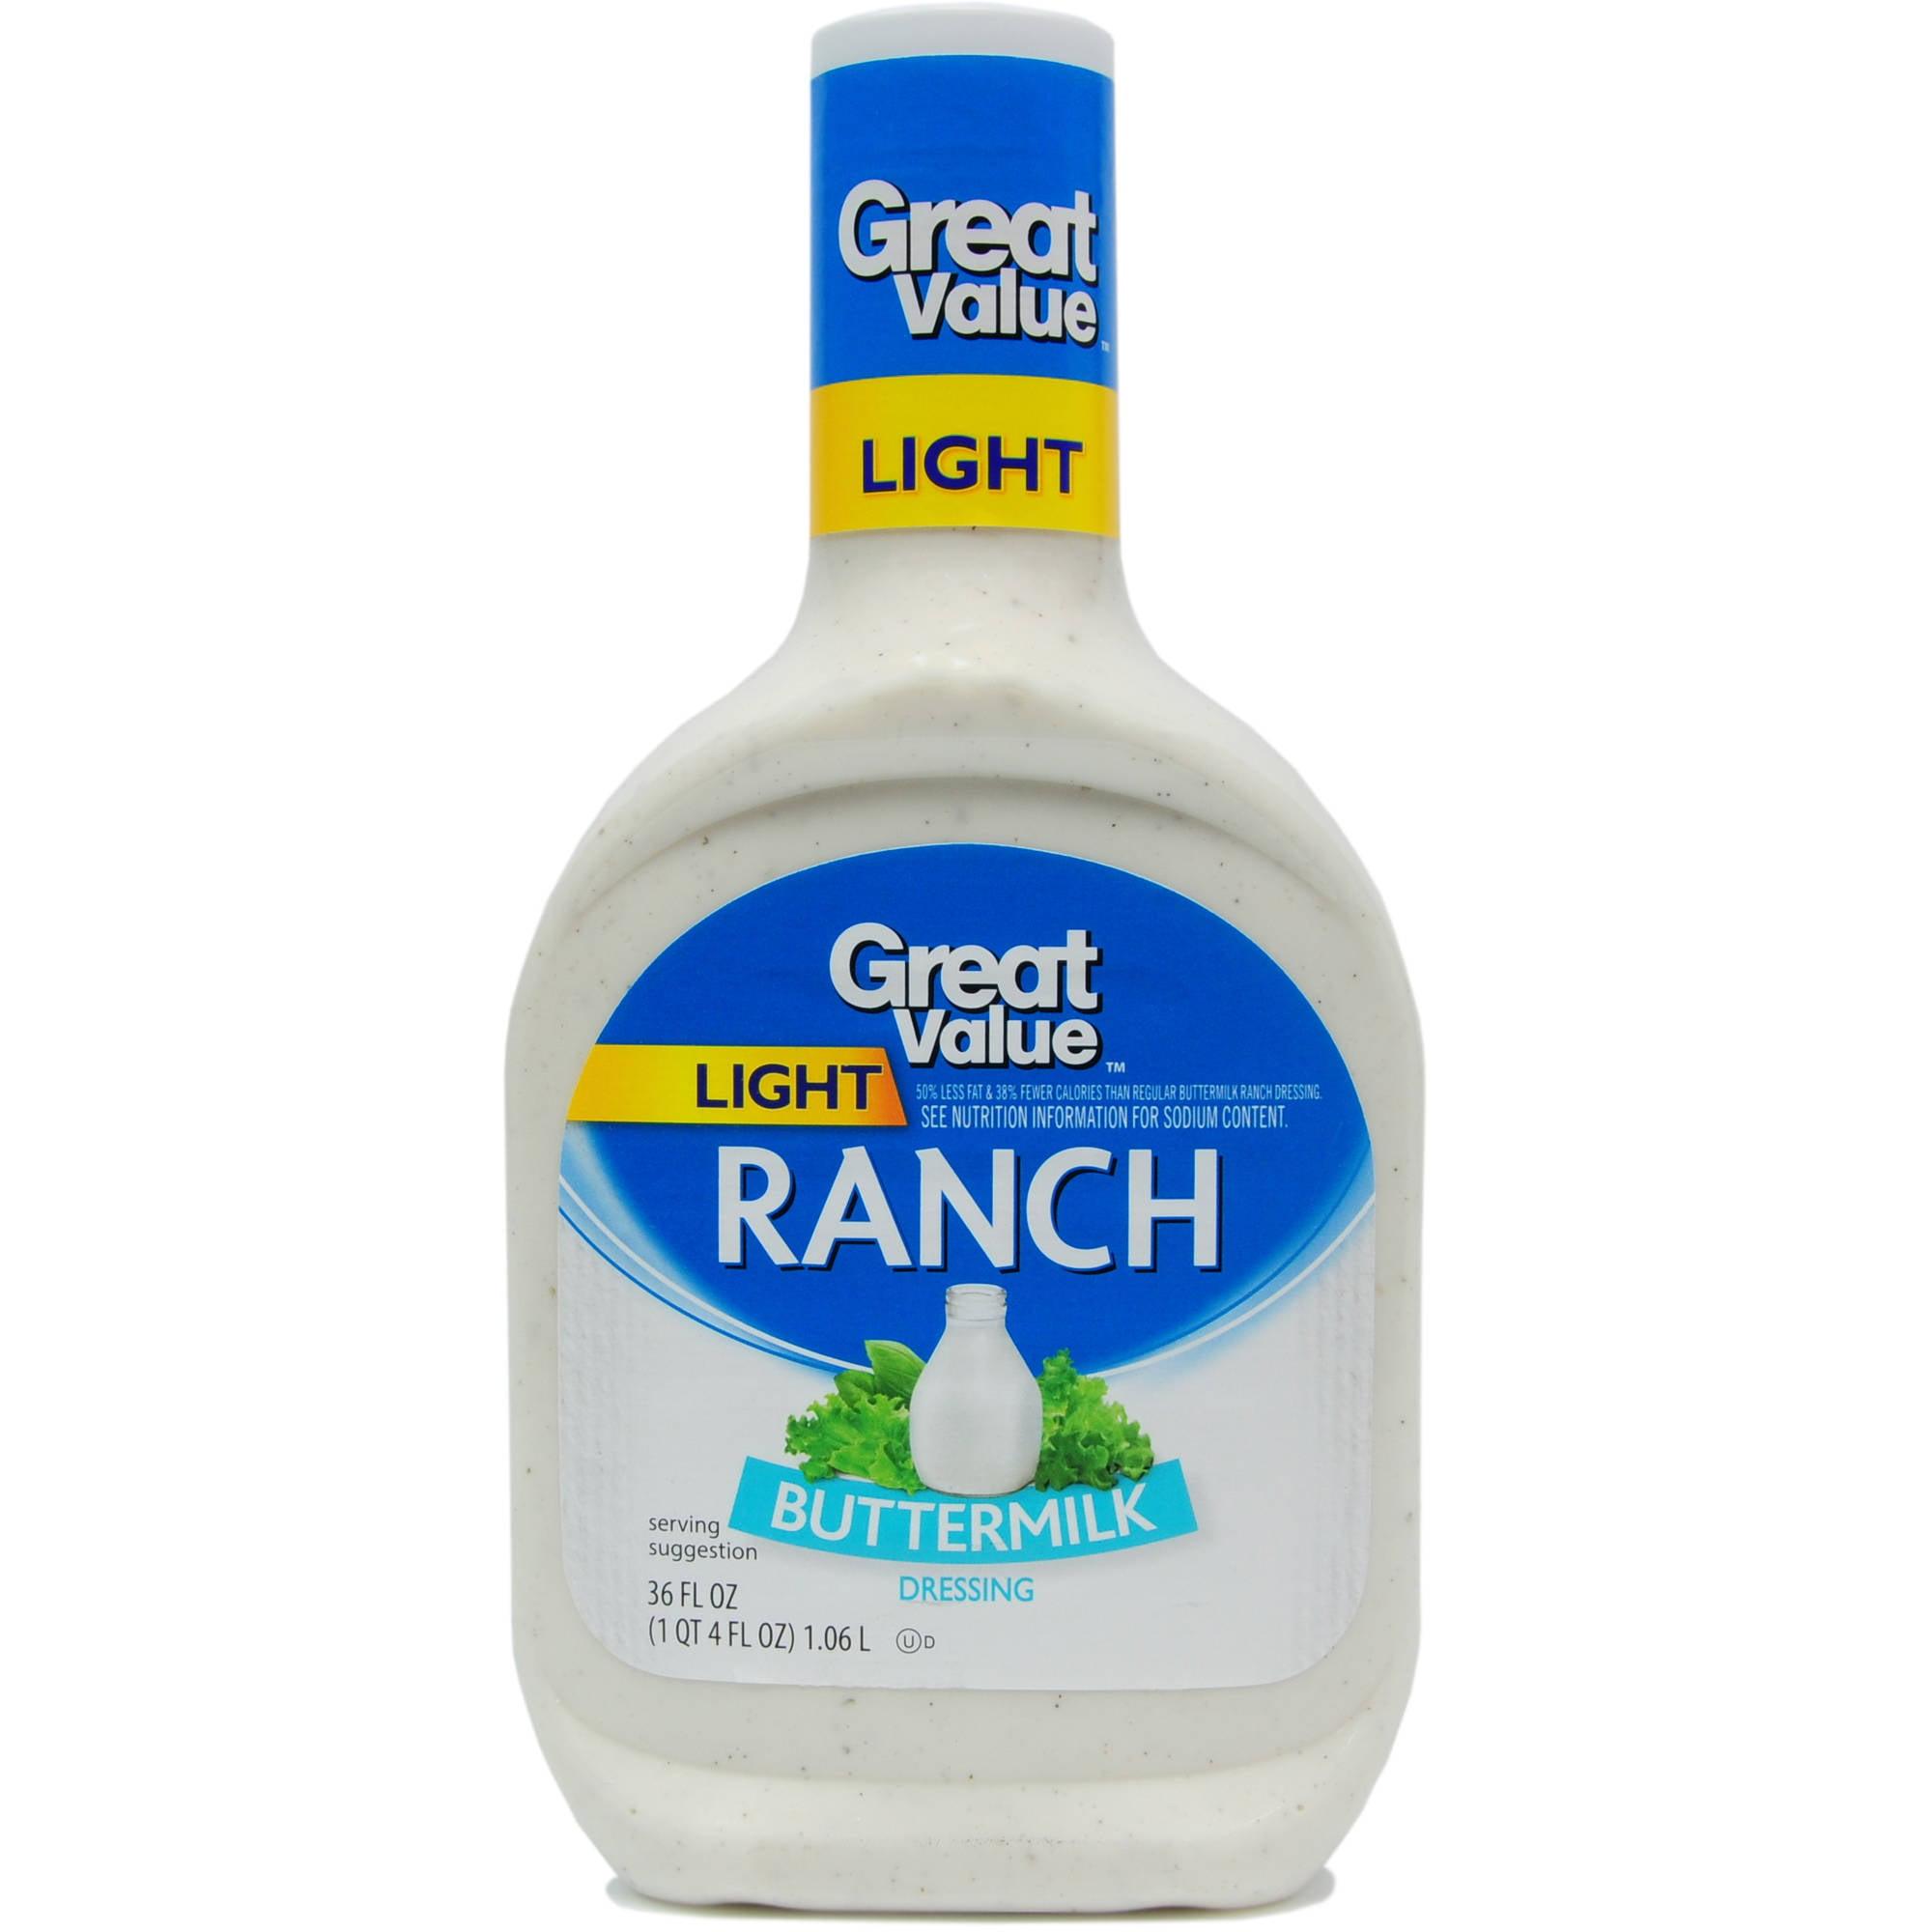 Great Value: Light Buttermilk Ranch Dressing, 36 Oz